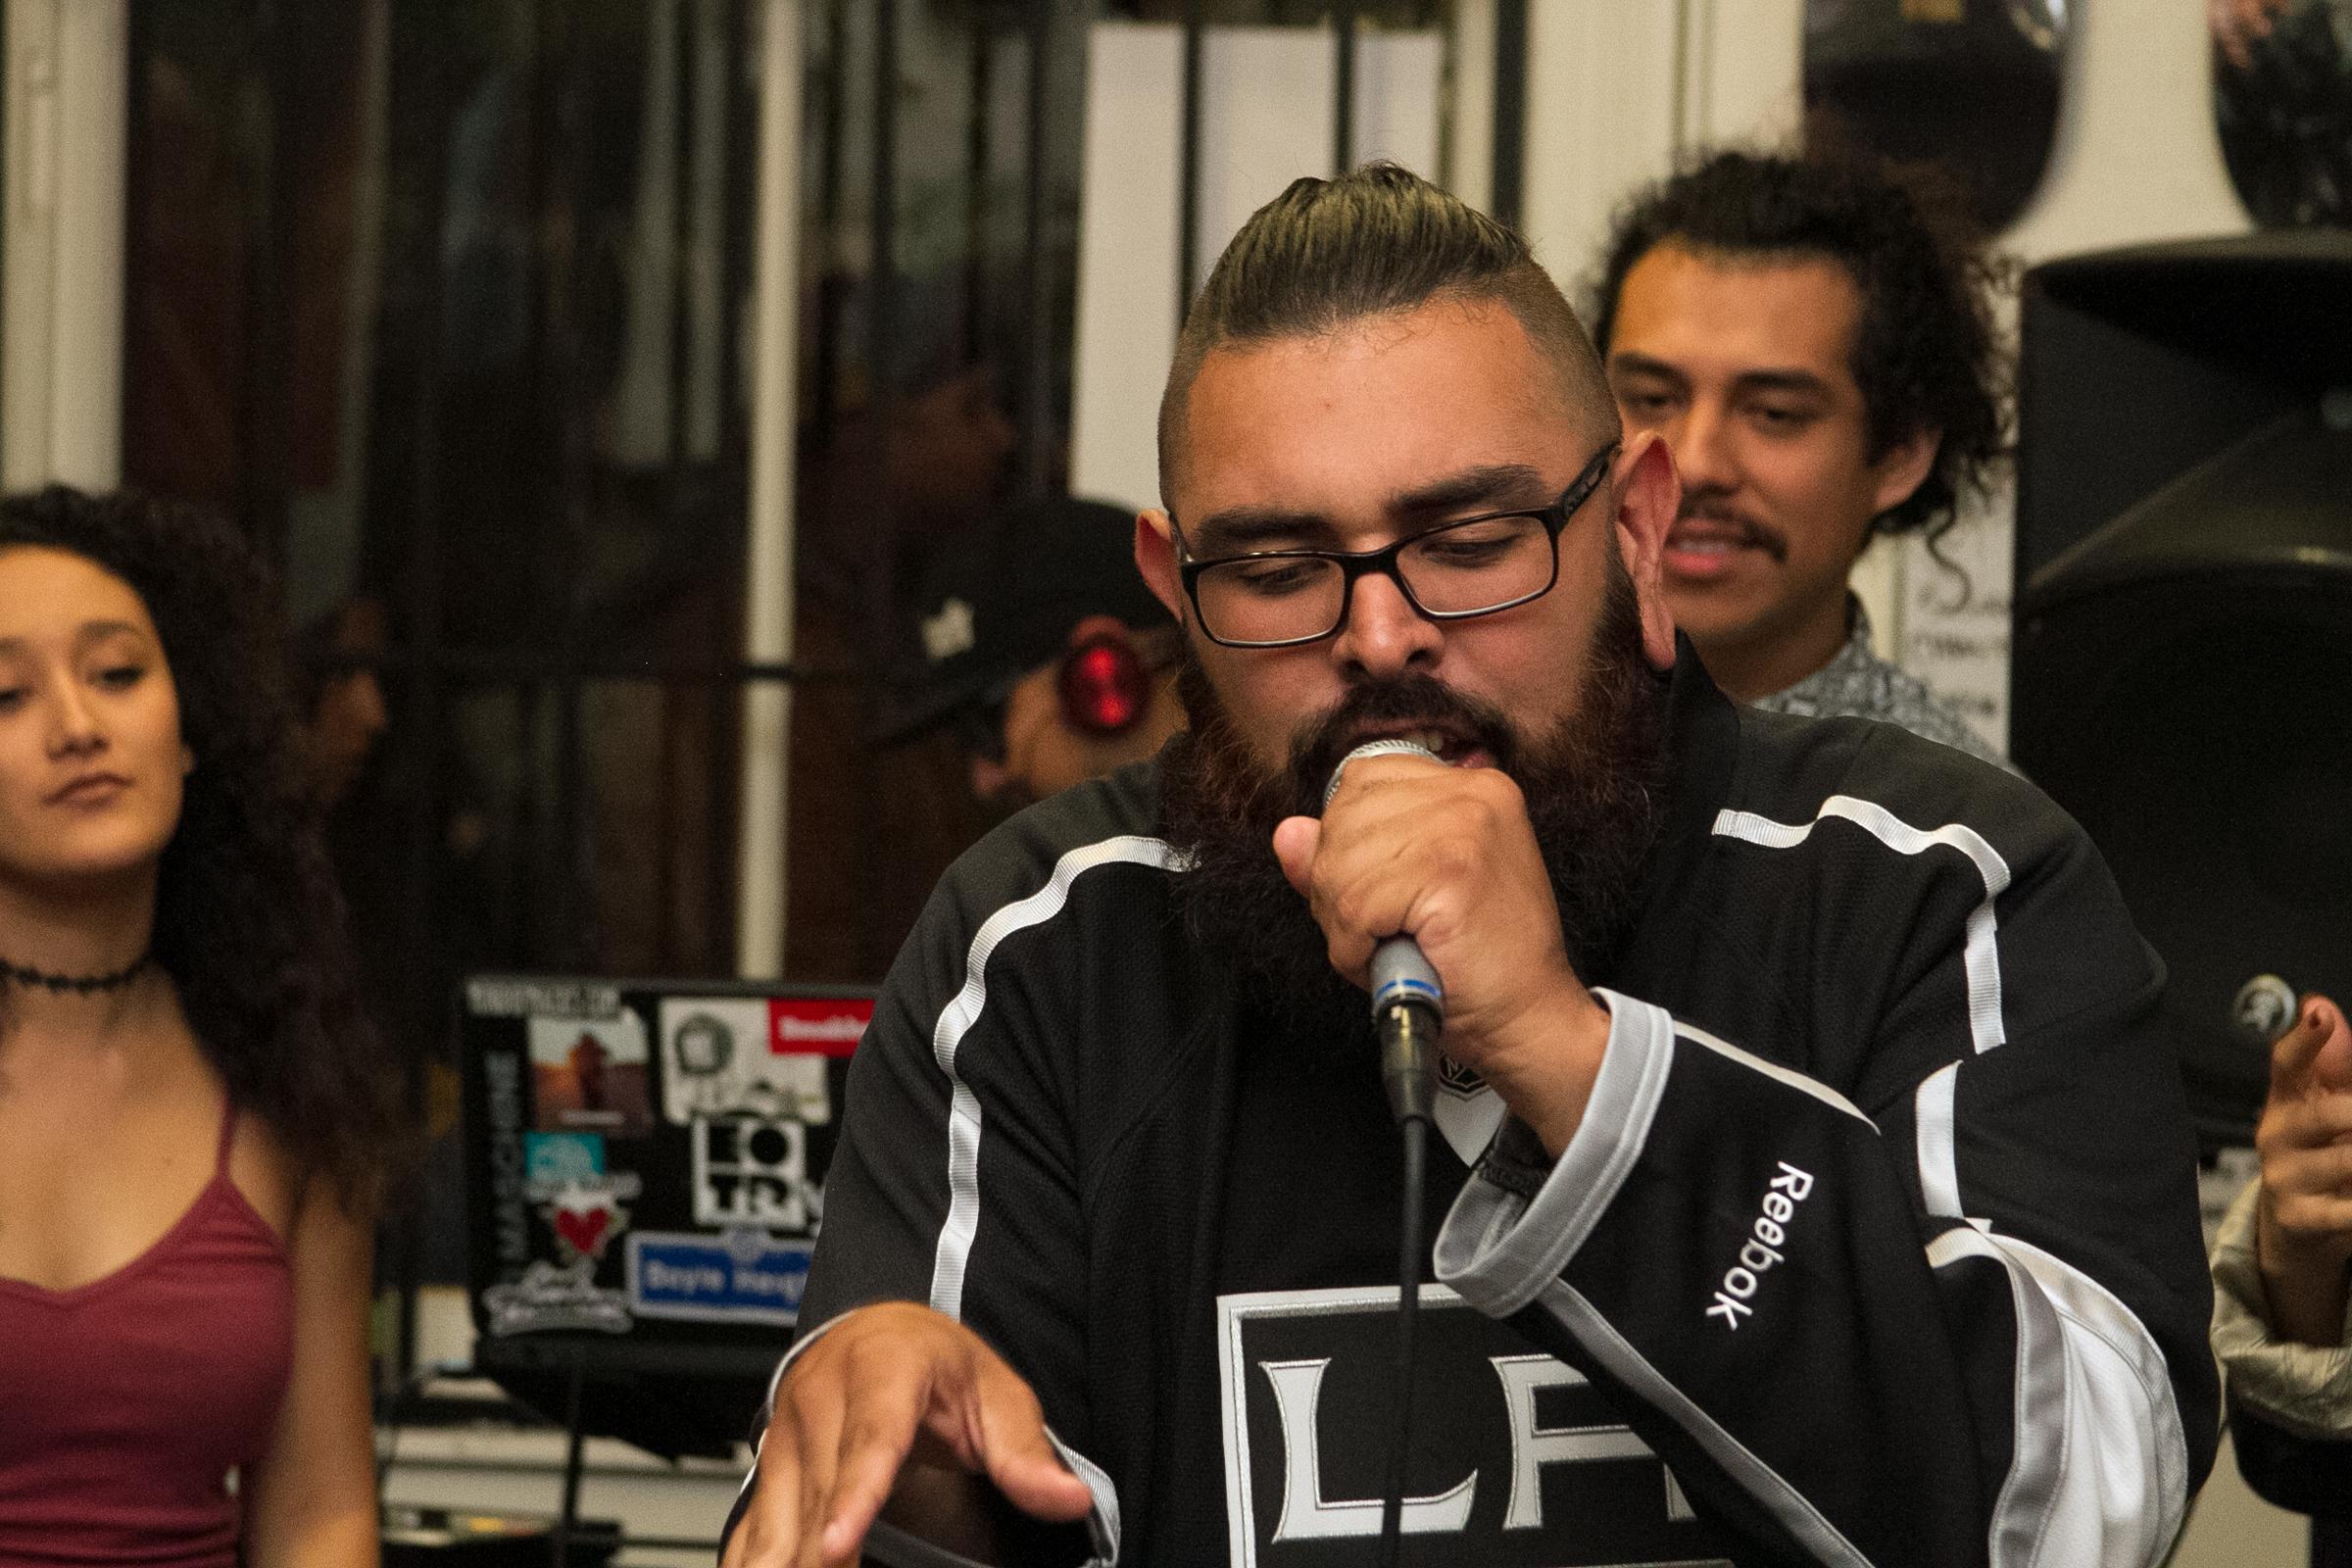 EOTR hip hop